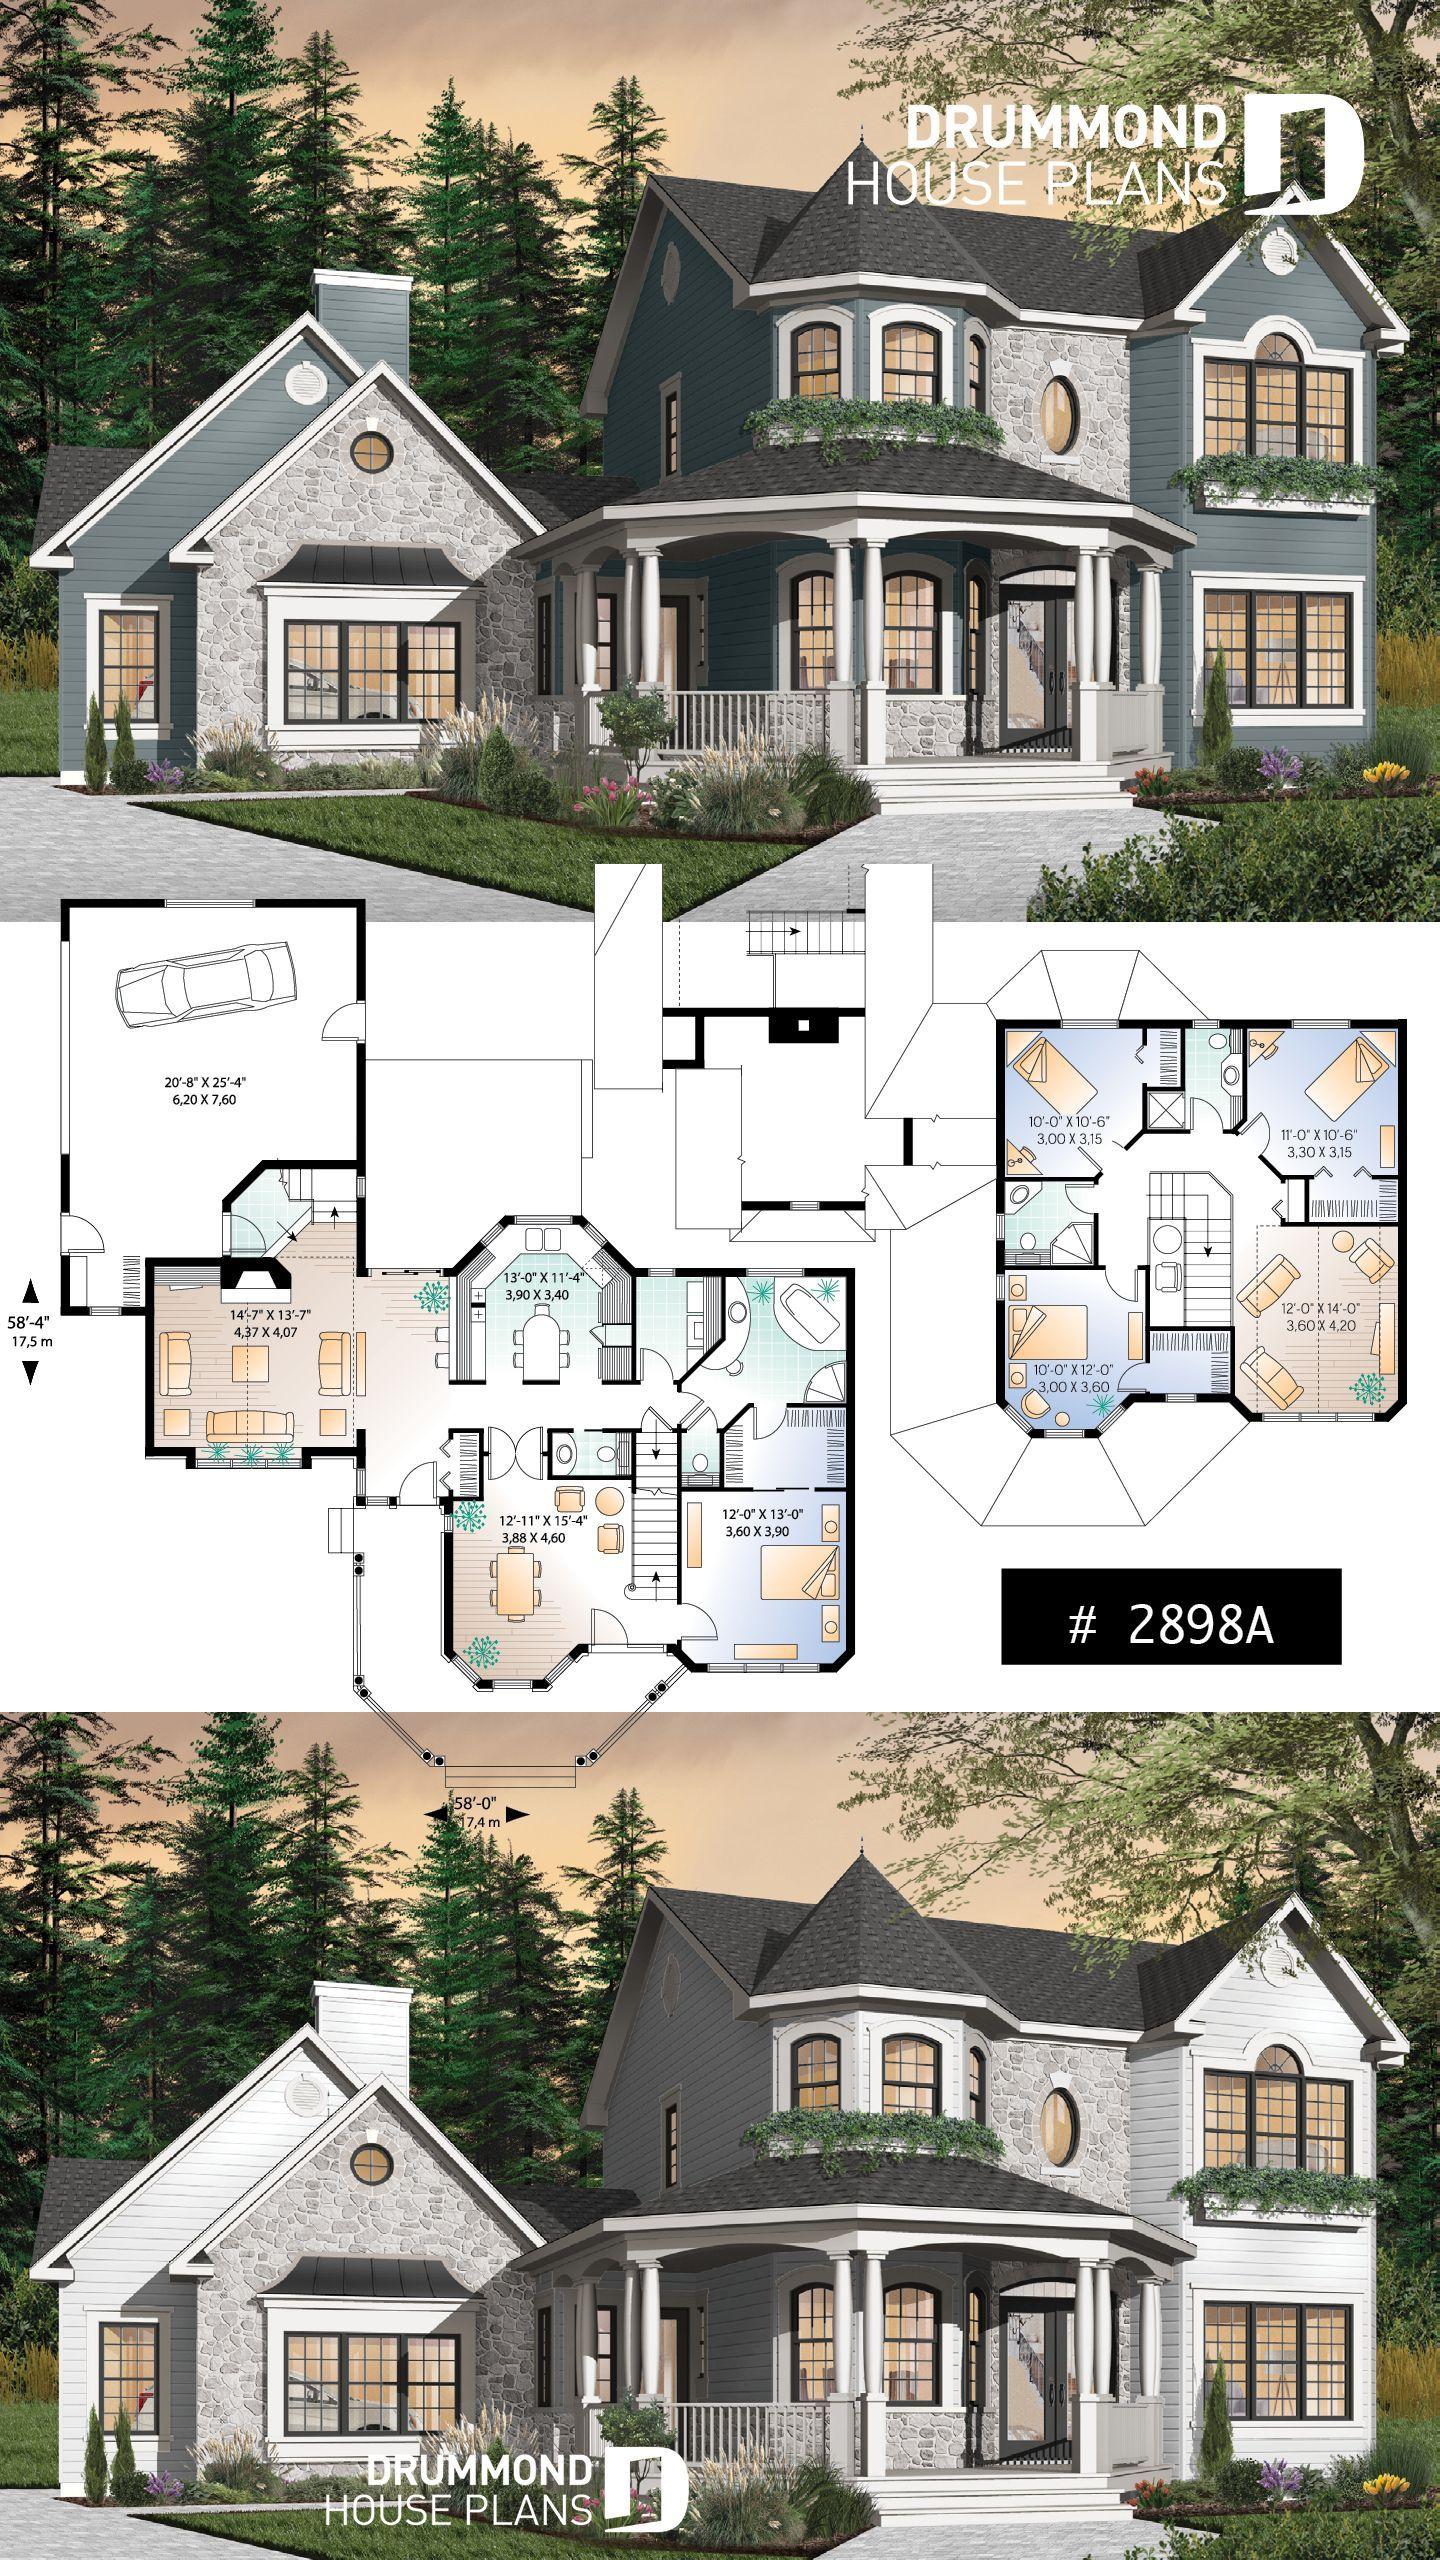 Bloxburg House Ideas 2 Floor In 2020 Victorian House Plans House Blueprints Sims 4 House Building